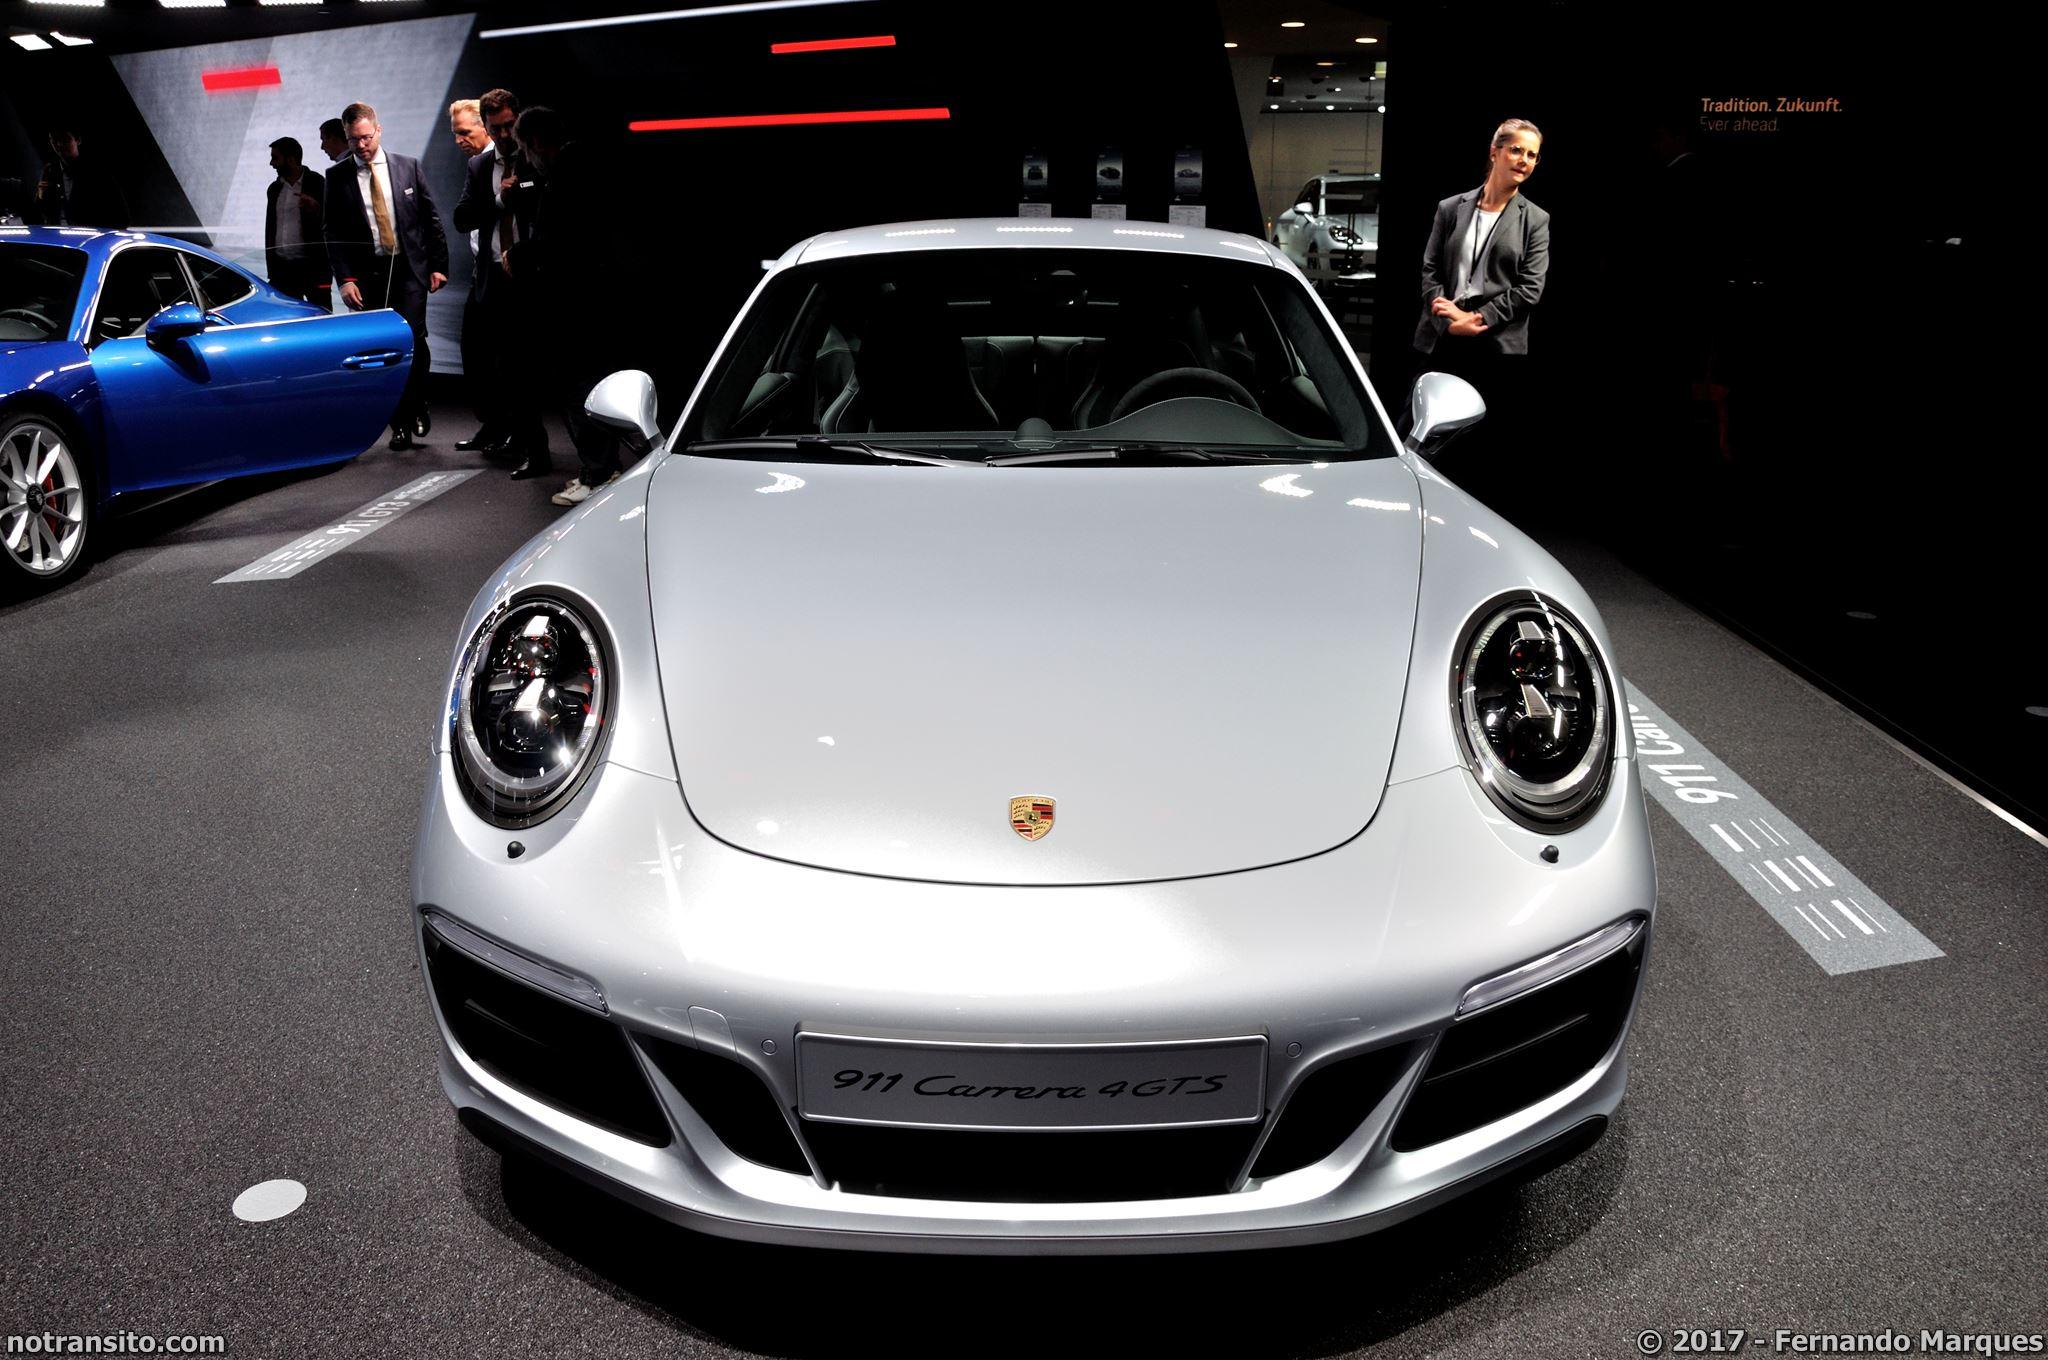 Porsche-911-Carrera-4-GTS-Frankfurt-2017-001